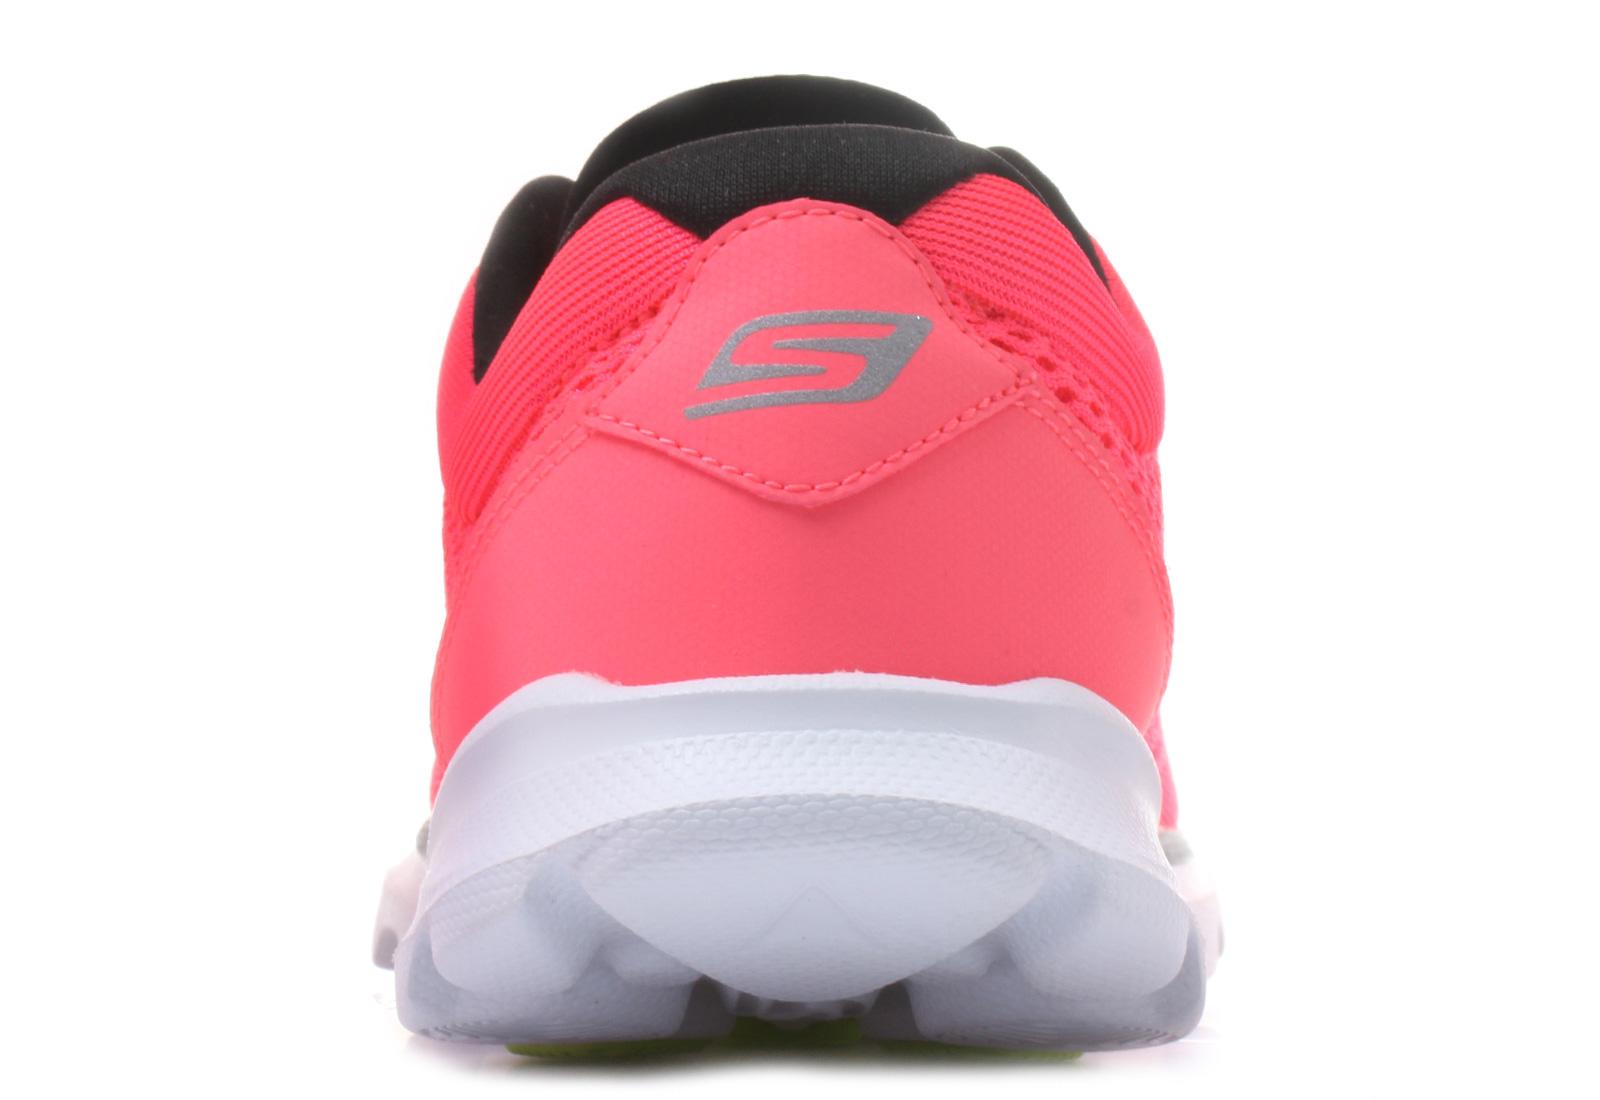 Skechers Cipő - Go Run Sprint - 13912-hpbk - Office Shoes Magyarország 2b04f1d353